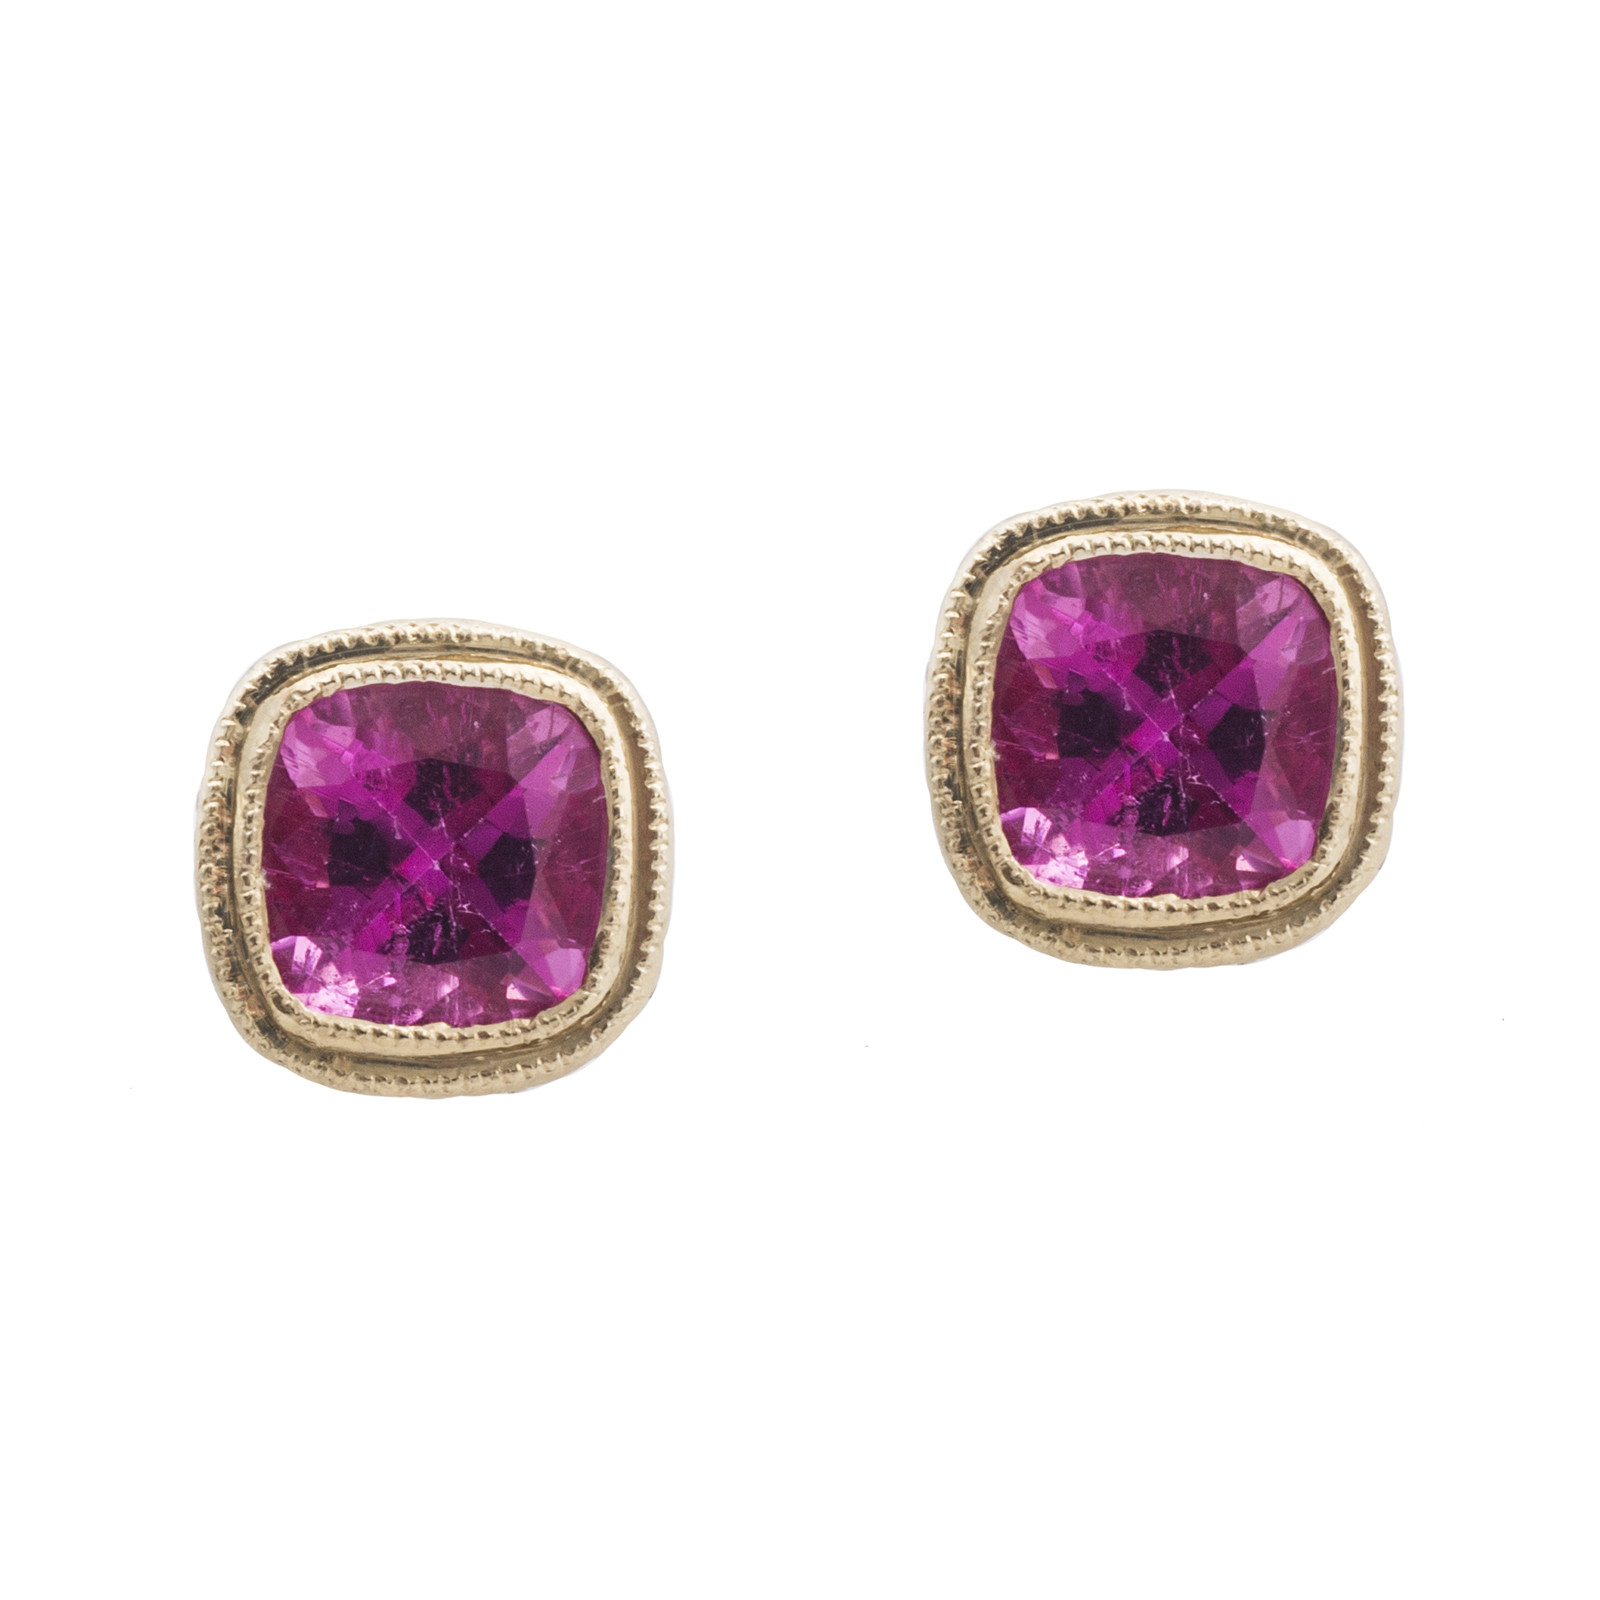 New 1.85 CTW Pink Tourmaline Earrings